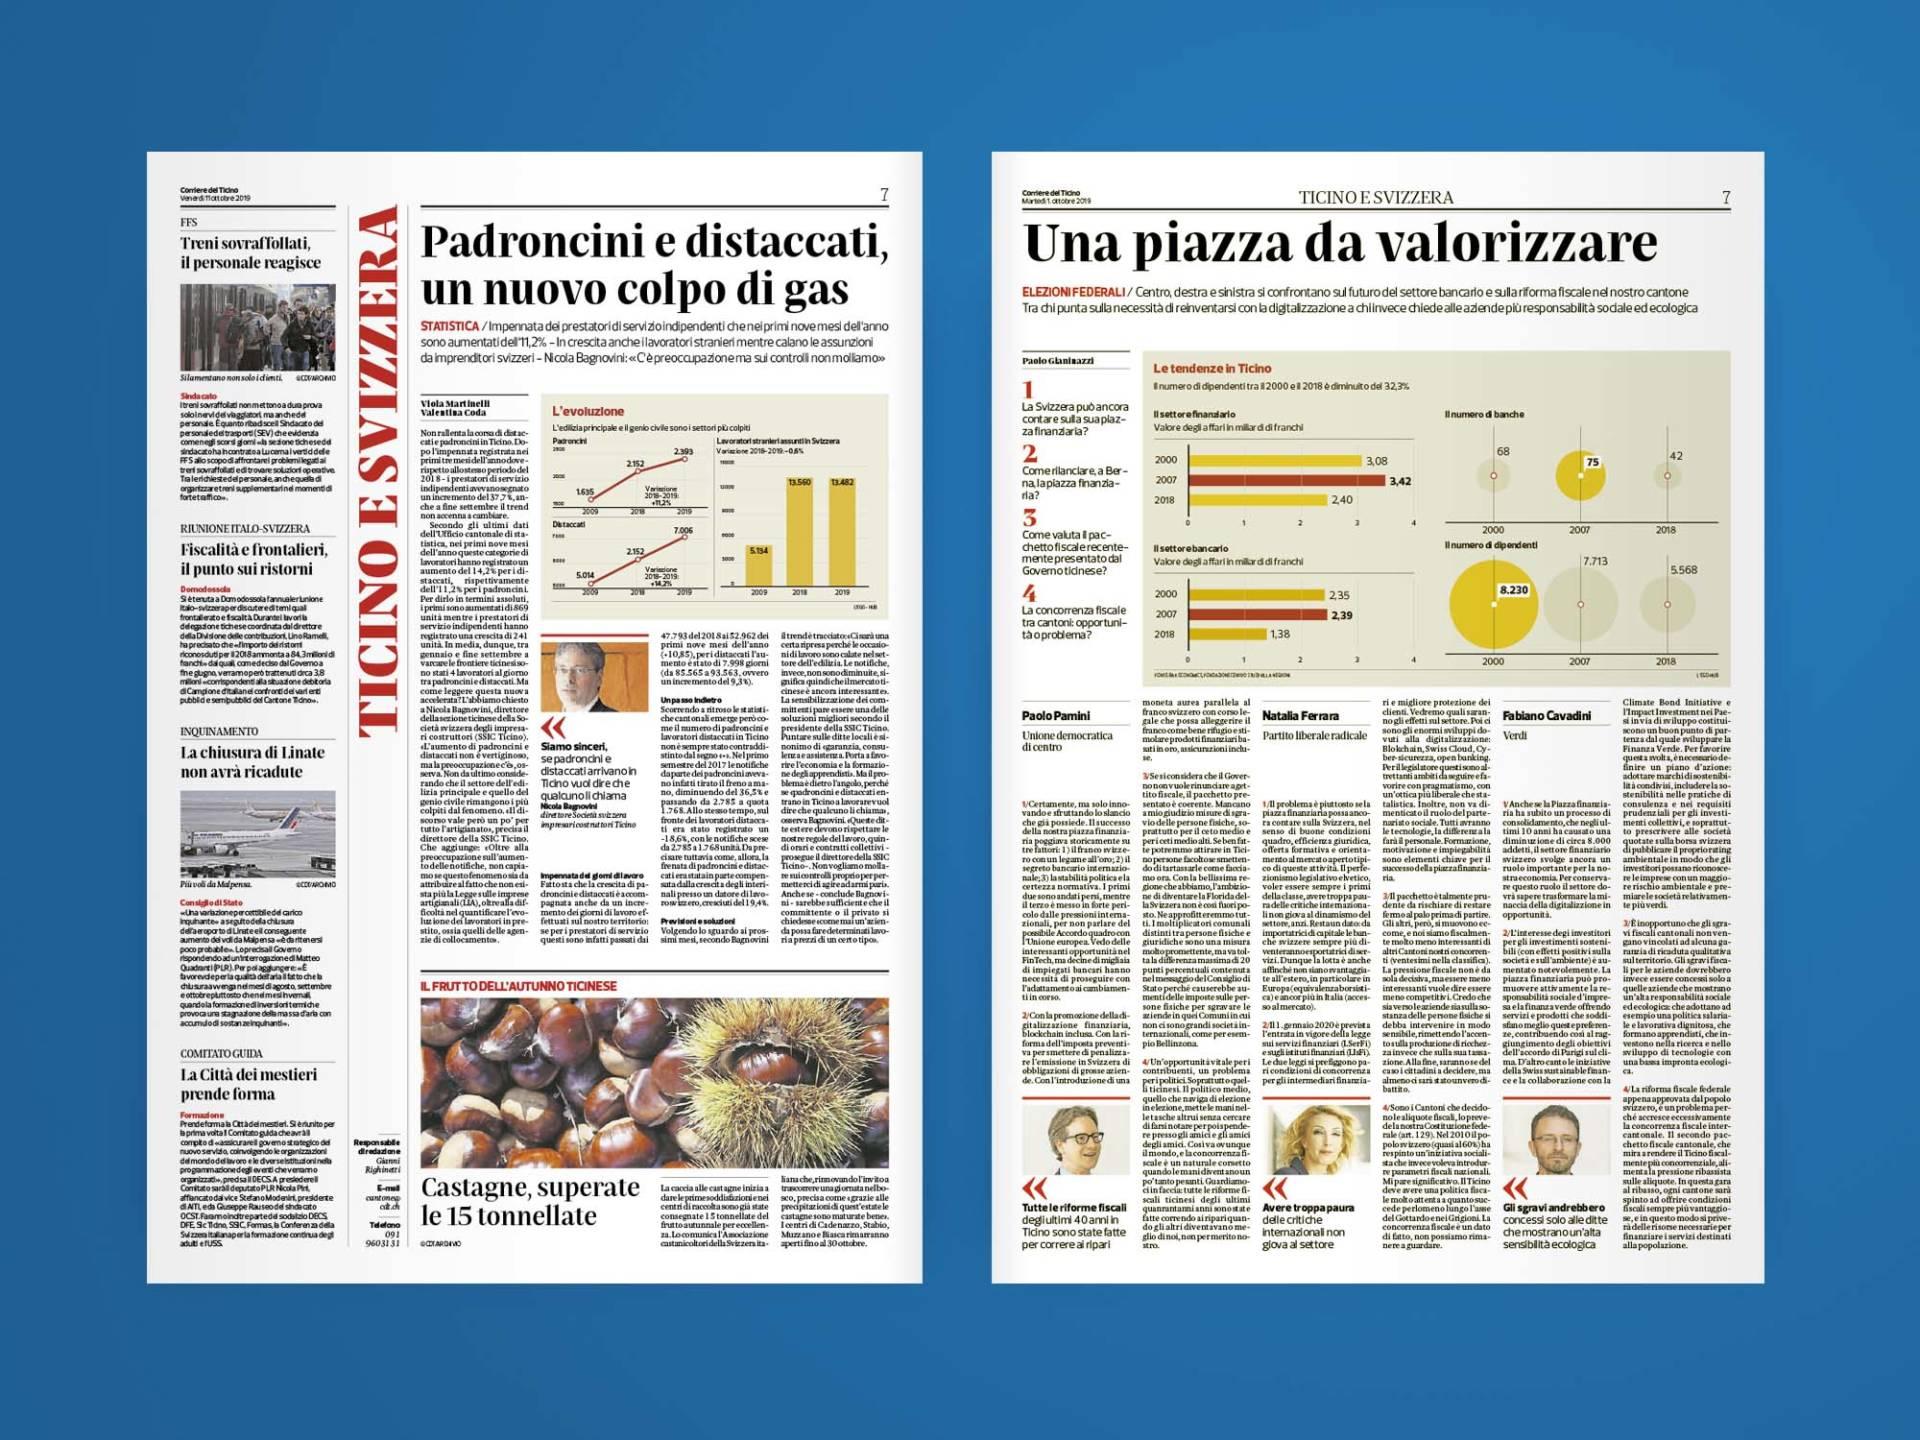 Corriere_del_Ticino_Info_09_Wenceslau_News_Design